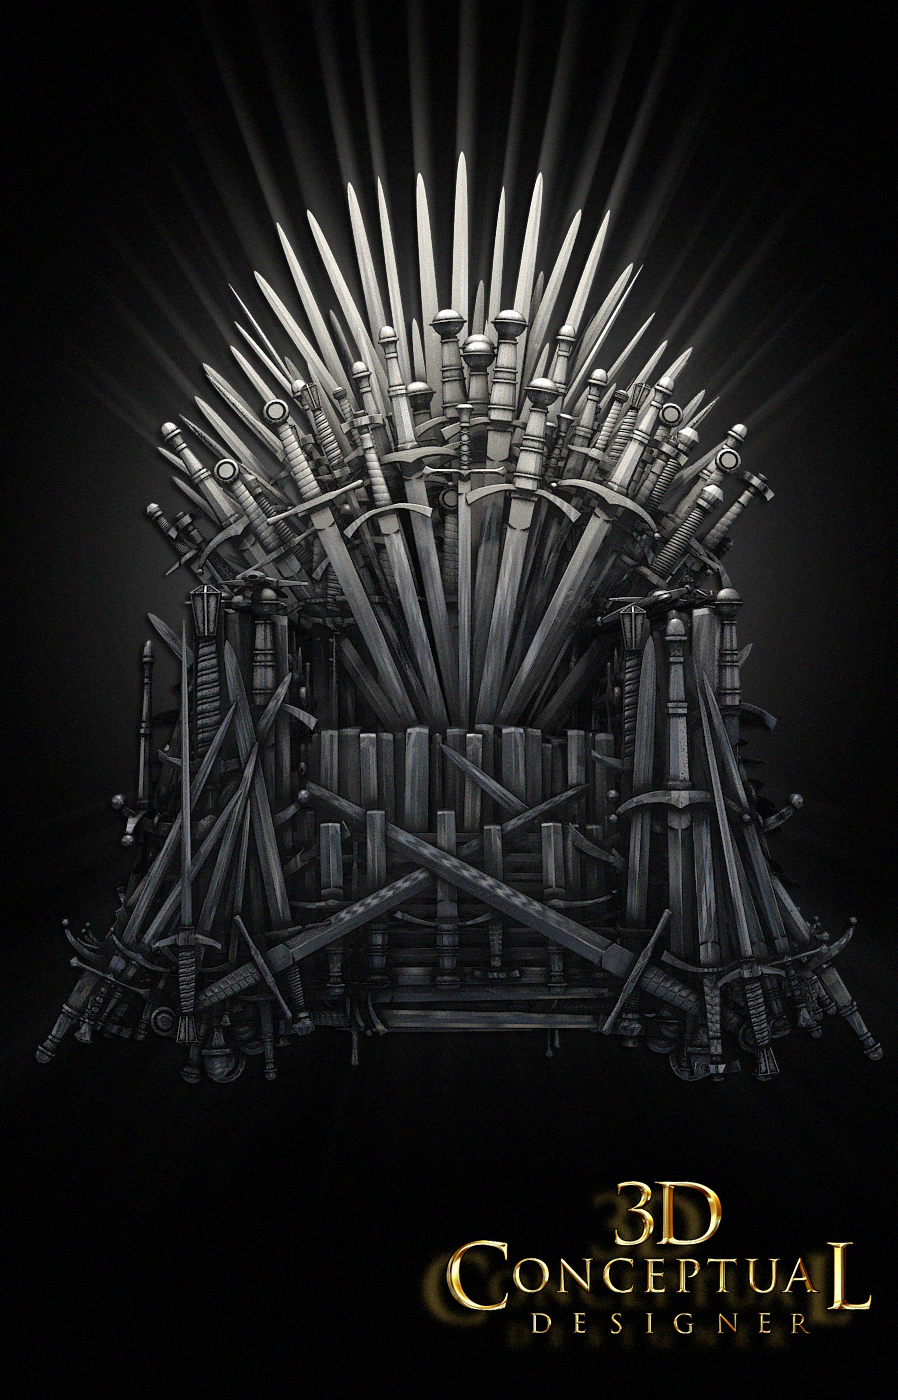 898x1400 3dconceptualdesignerblog Project Review Game Of Thrones Season 3